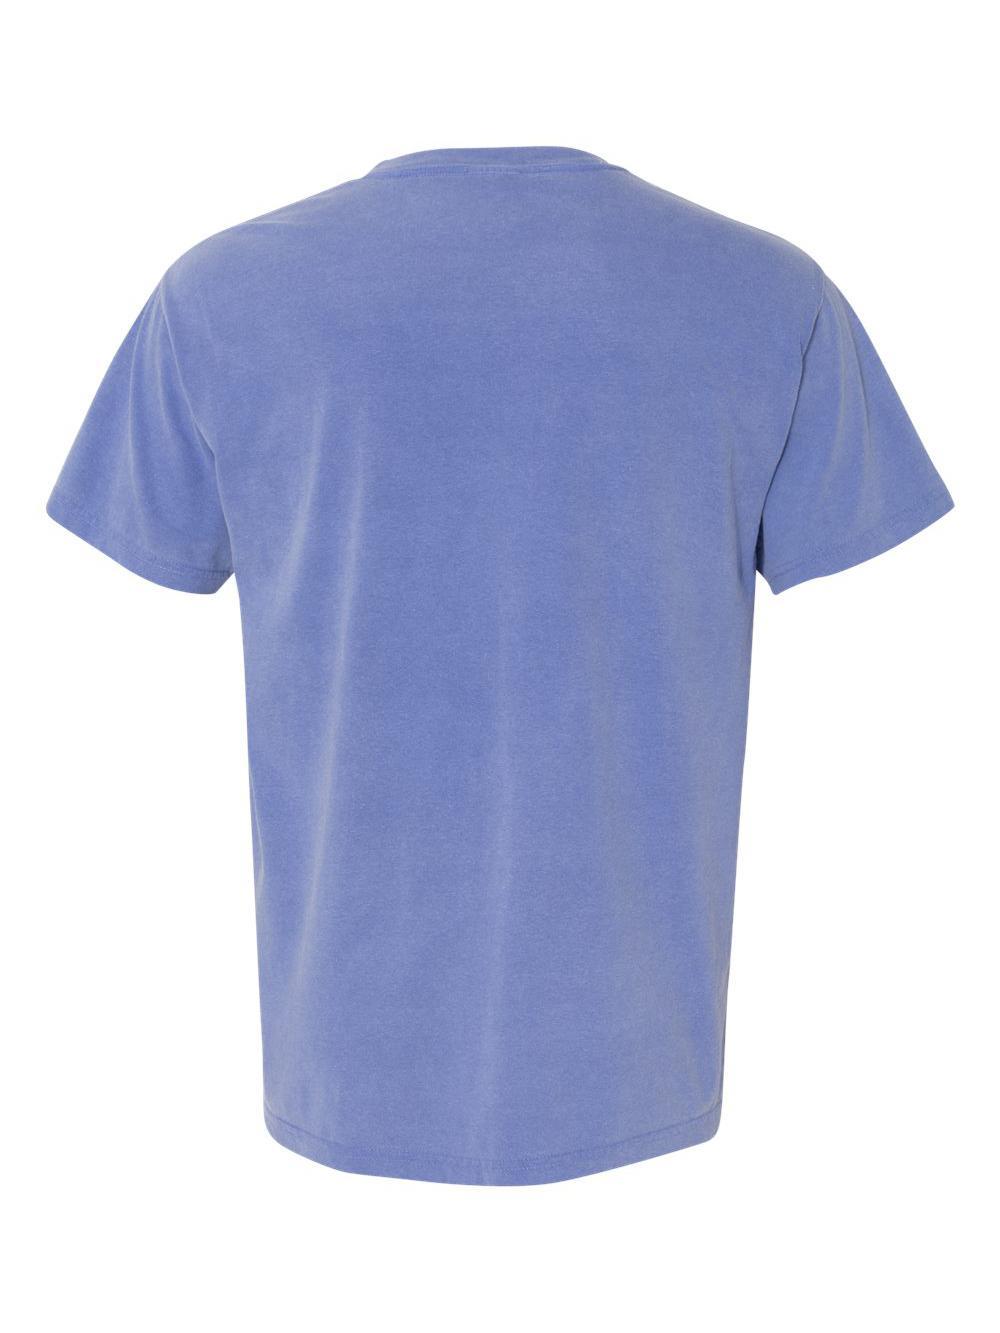 Comfort-Colors-Garment-Dyed-Heavyweight-Ringspun-Short-Sleeve-Shirt-1717 thumbnail 106